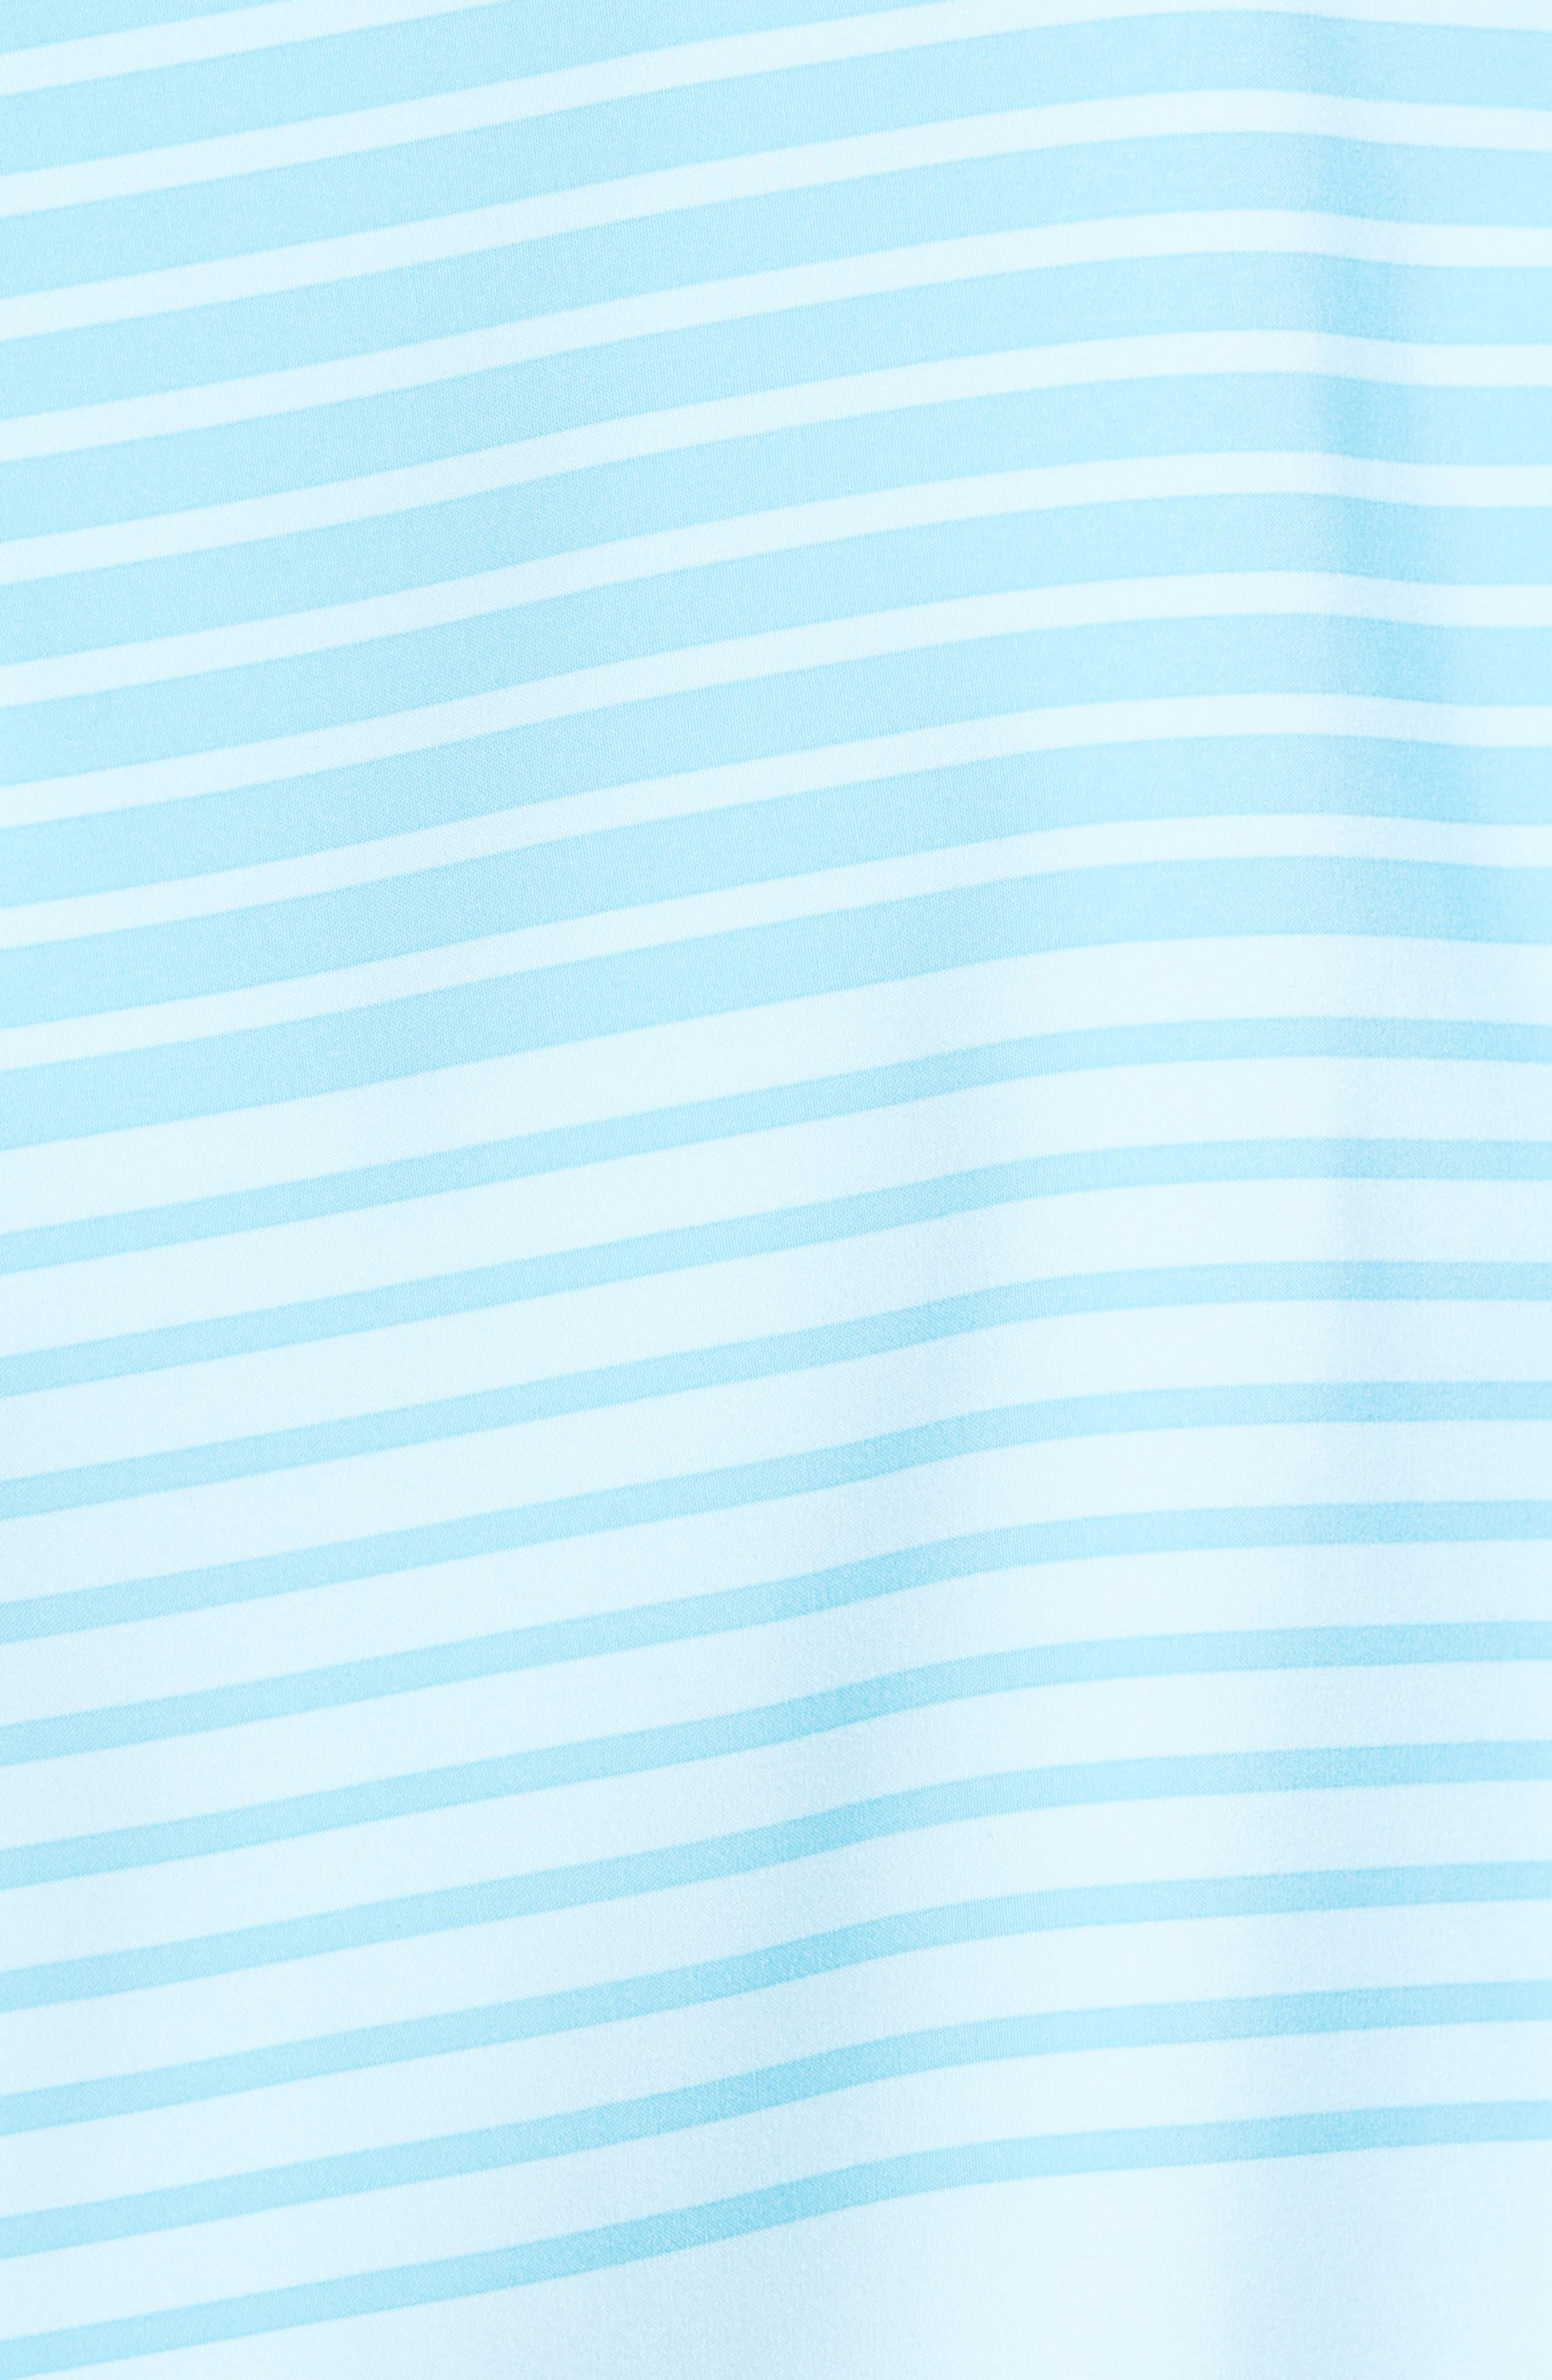 VINEYARD VINES,                             Sculplin Stripe Tech Board Shorts,                             Alternate thumbnail 5, color,                             459